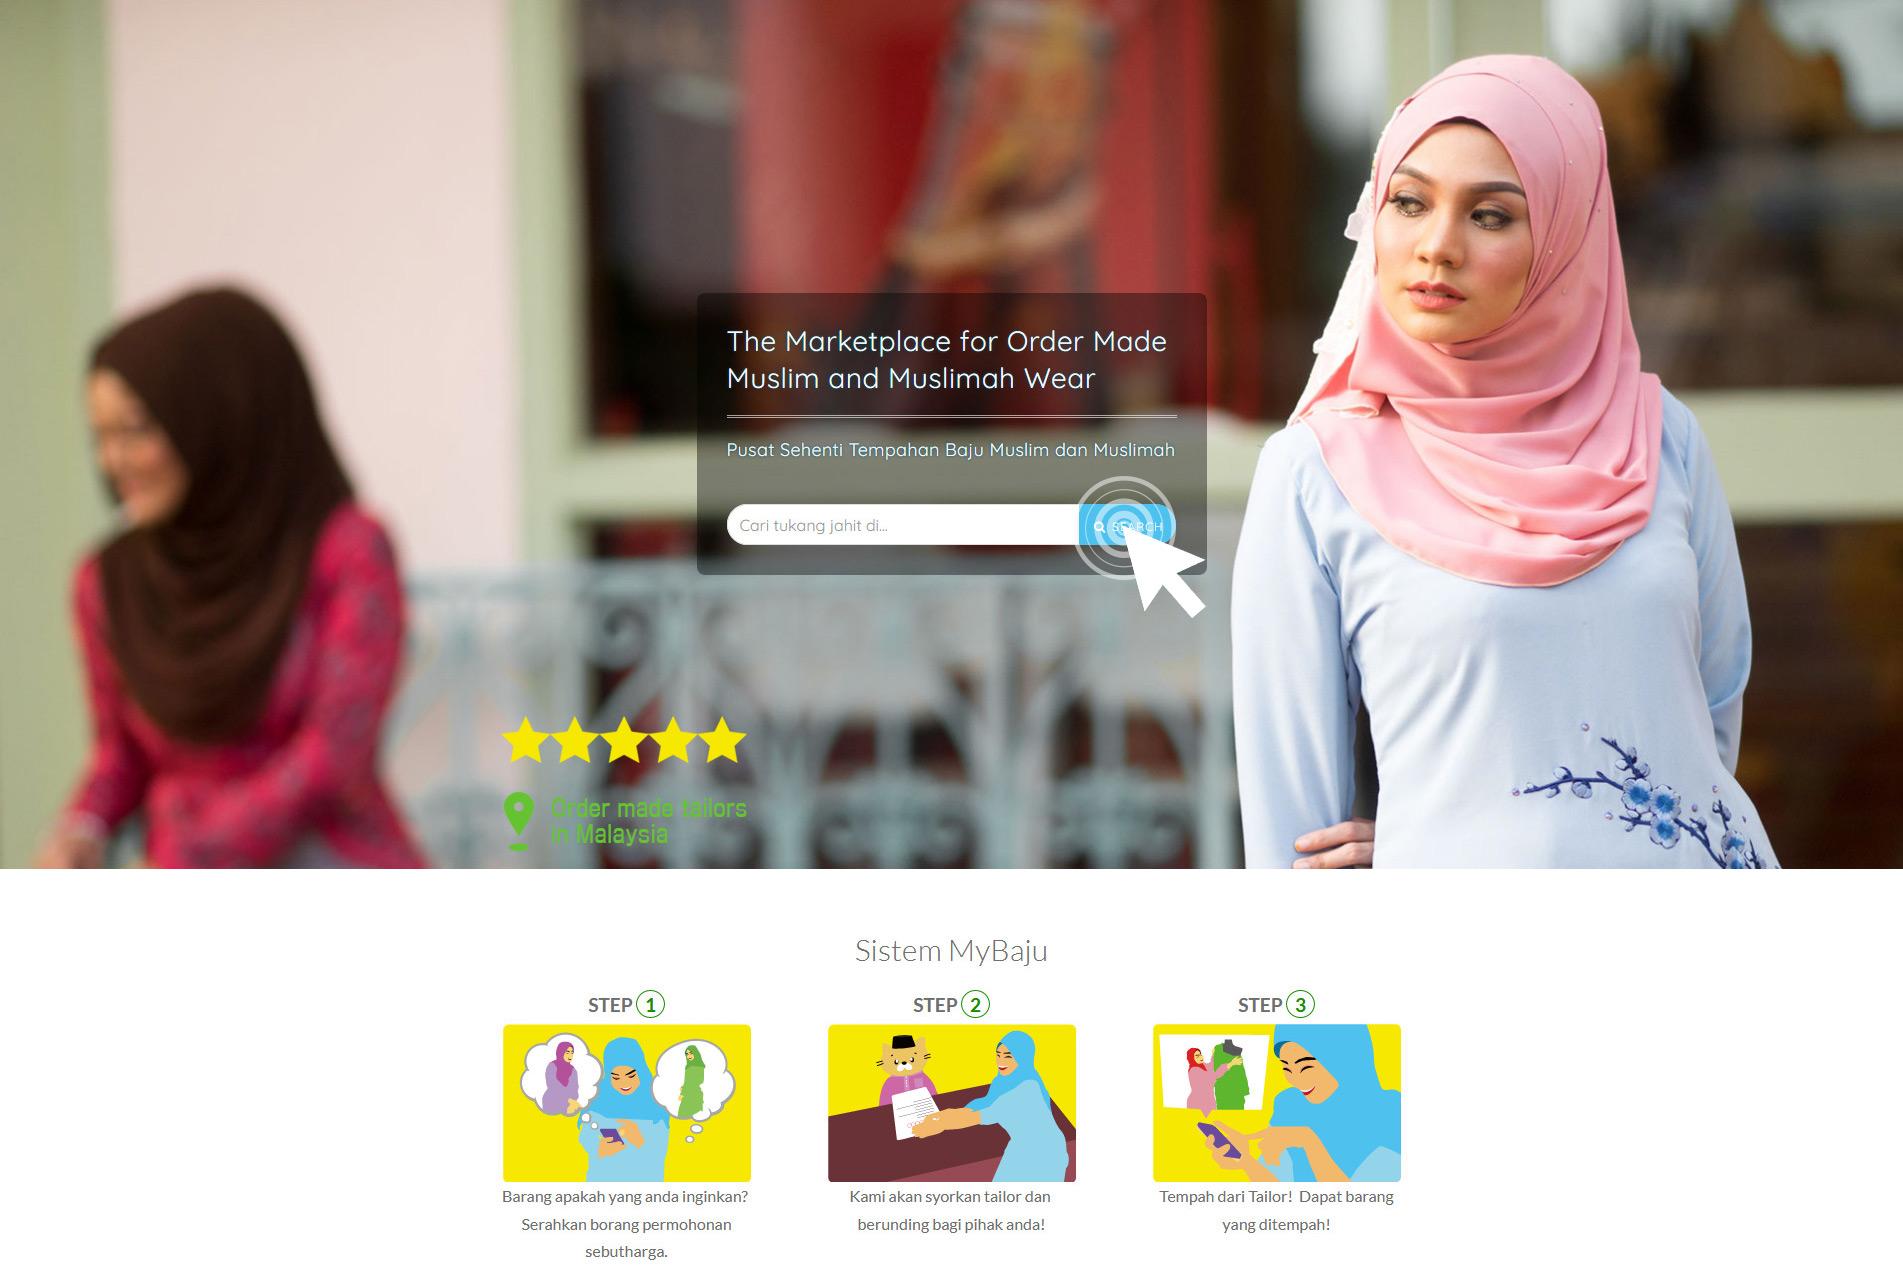 MyBaju - order made traditional tailors in Malaysia